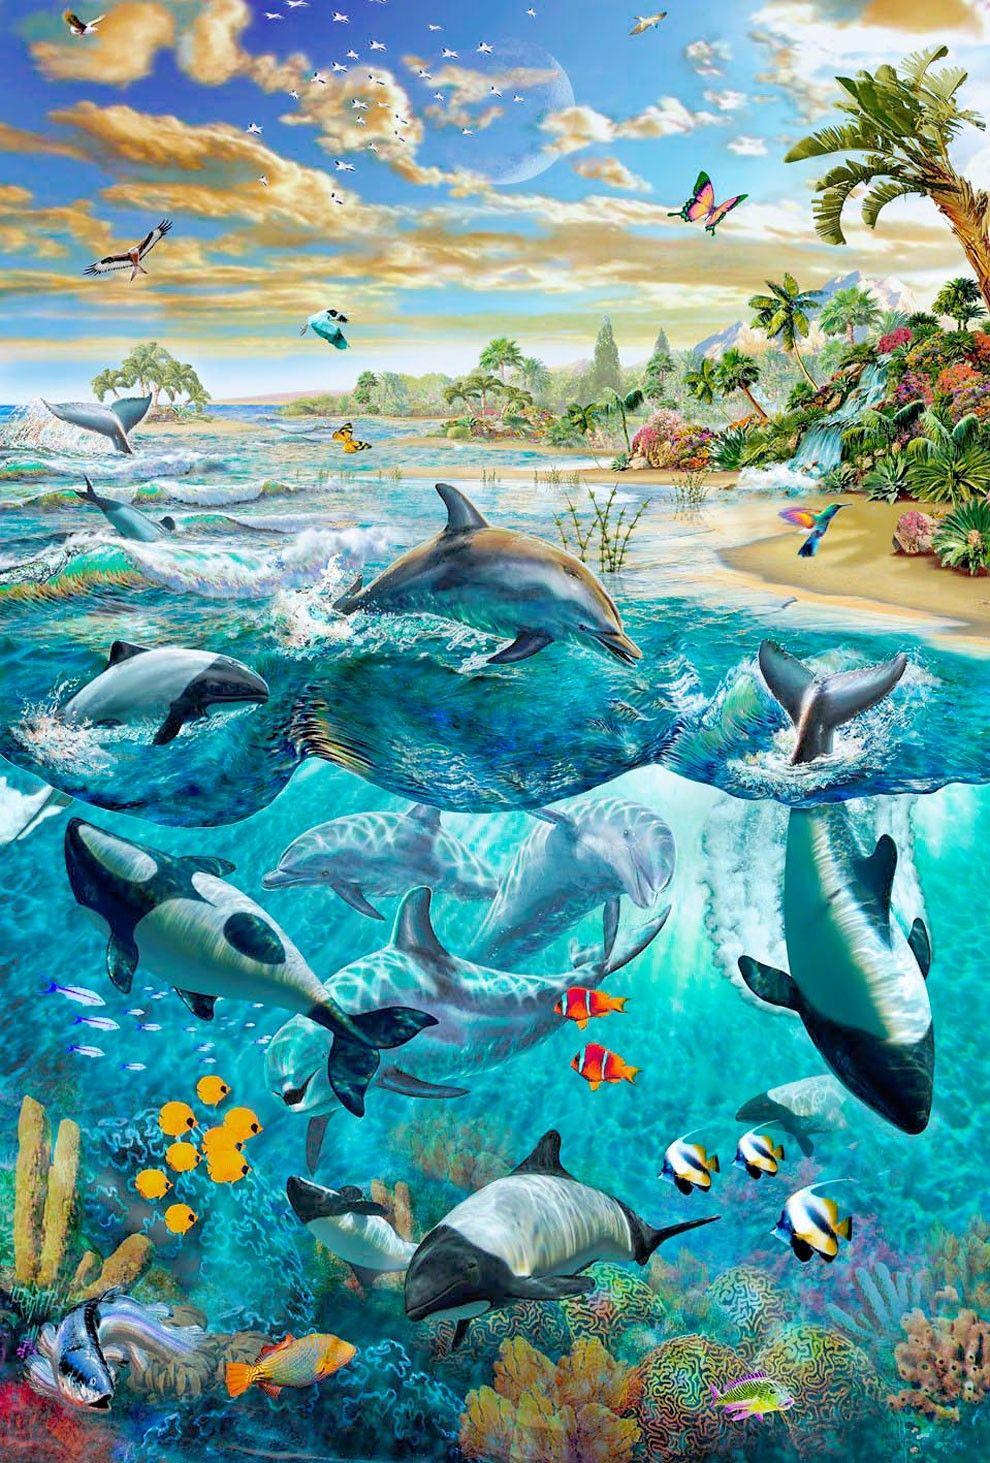 Imaginative Inspiration From Grasp Illustrator Adrian Chesterman Photo Vide Dolphin Art Airbrush Art Underwater Art